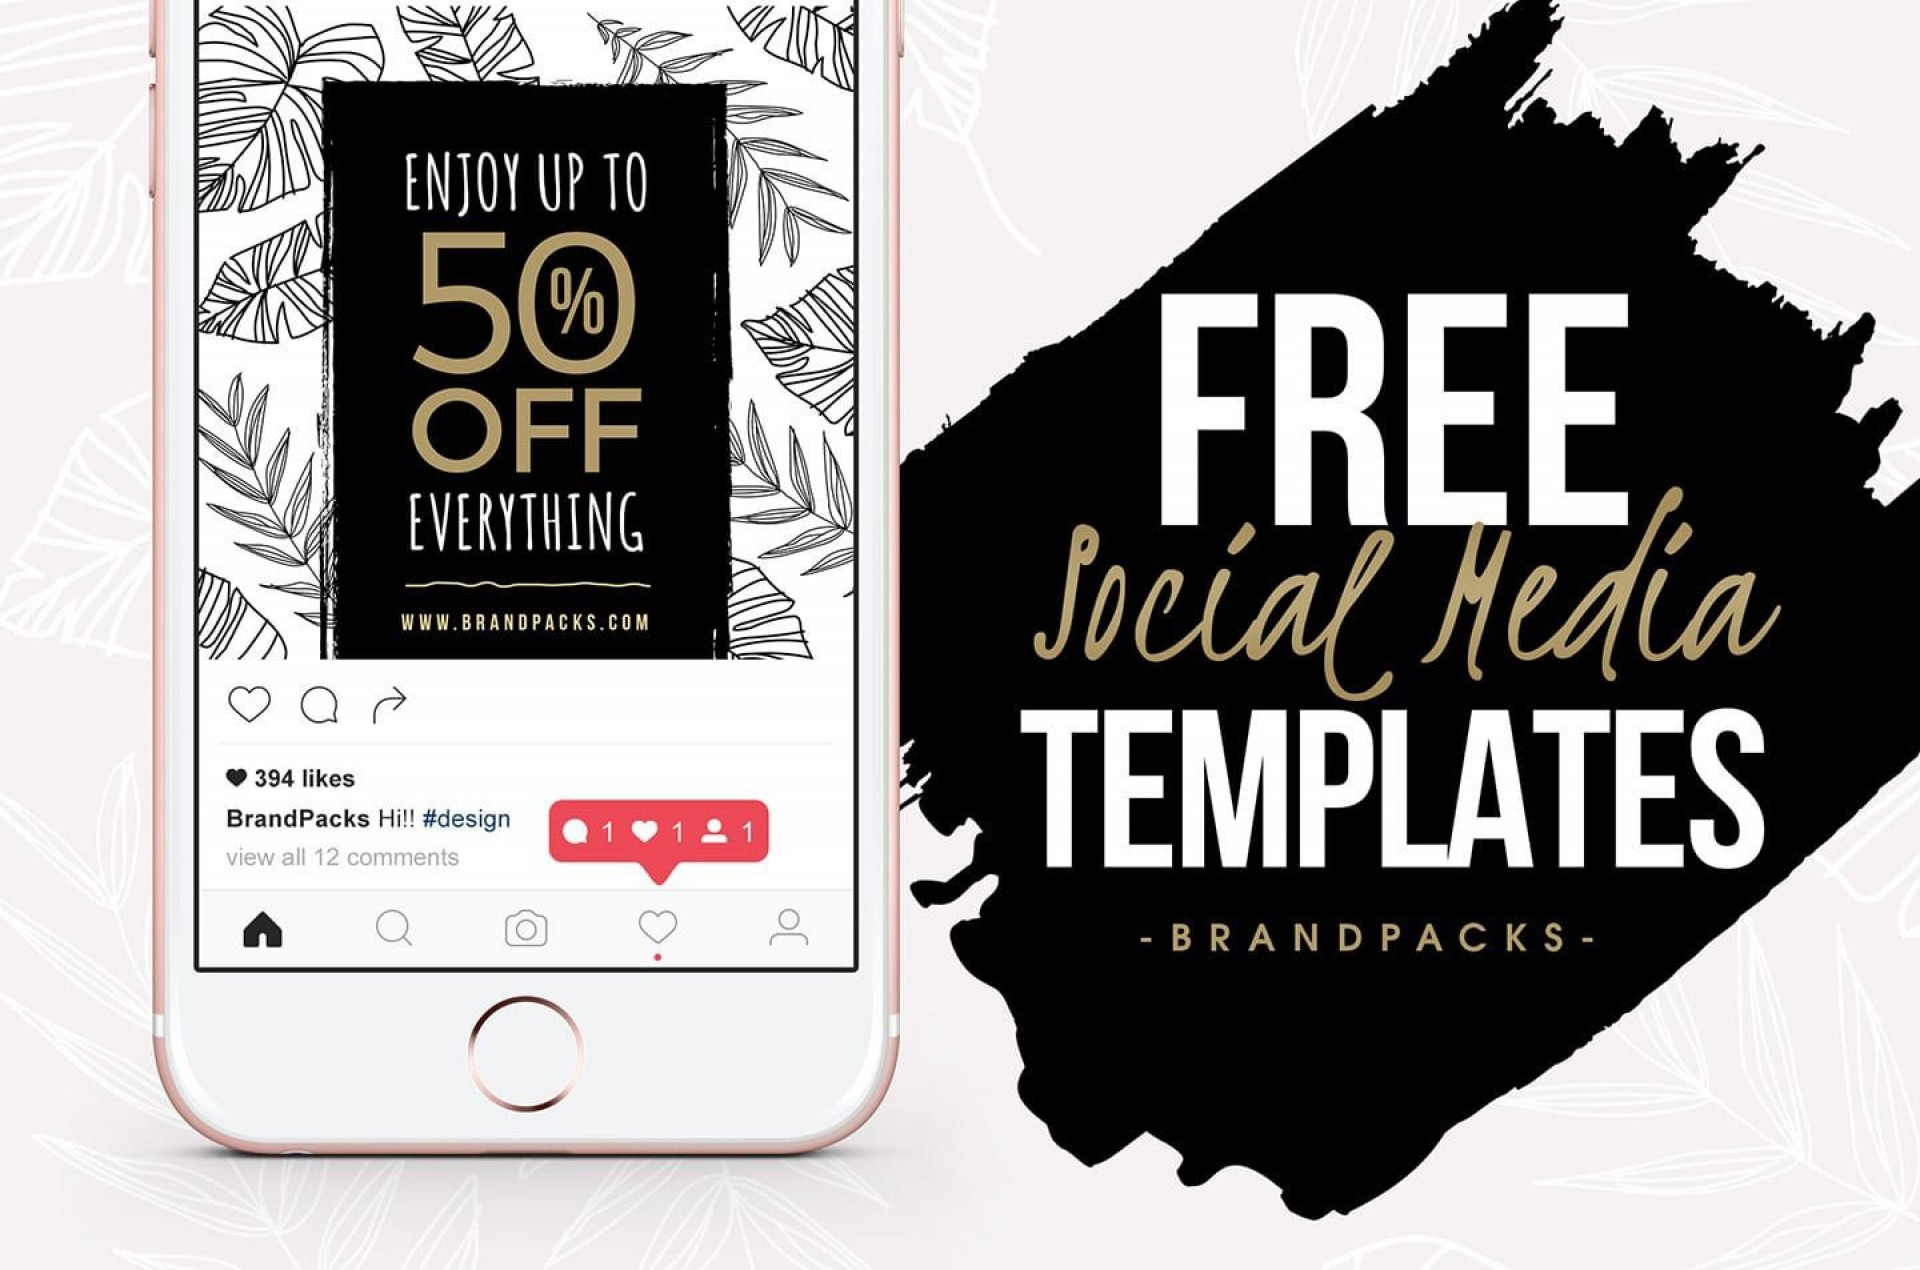 008 Impressive Social Media Template Free Psd Example  Download1920